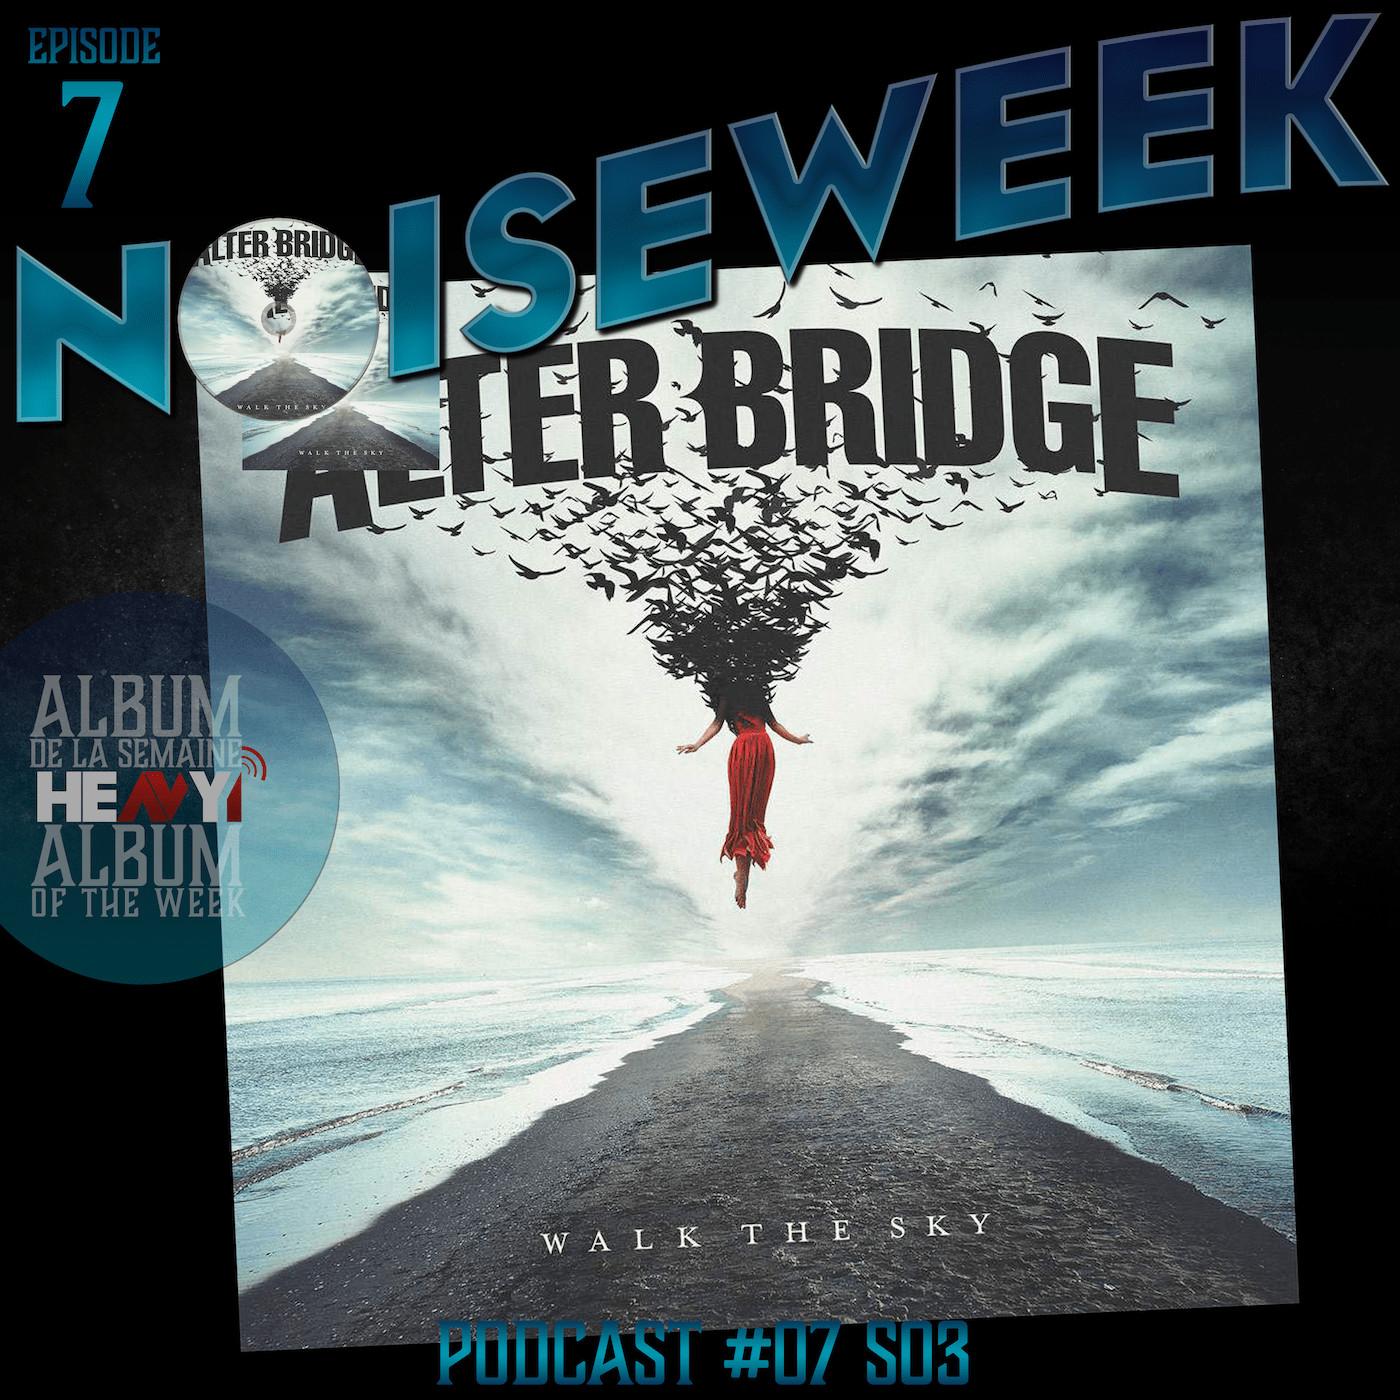 Noiseweek #07 Saison 3